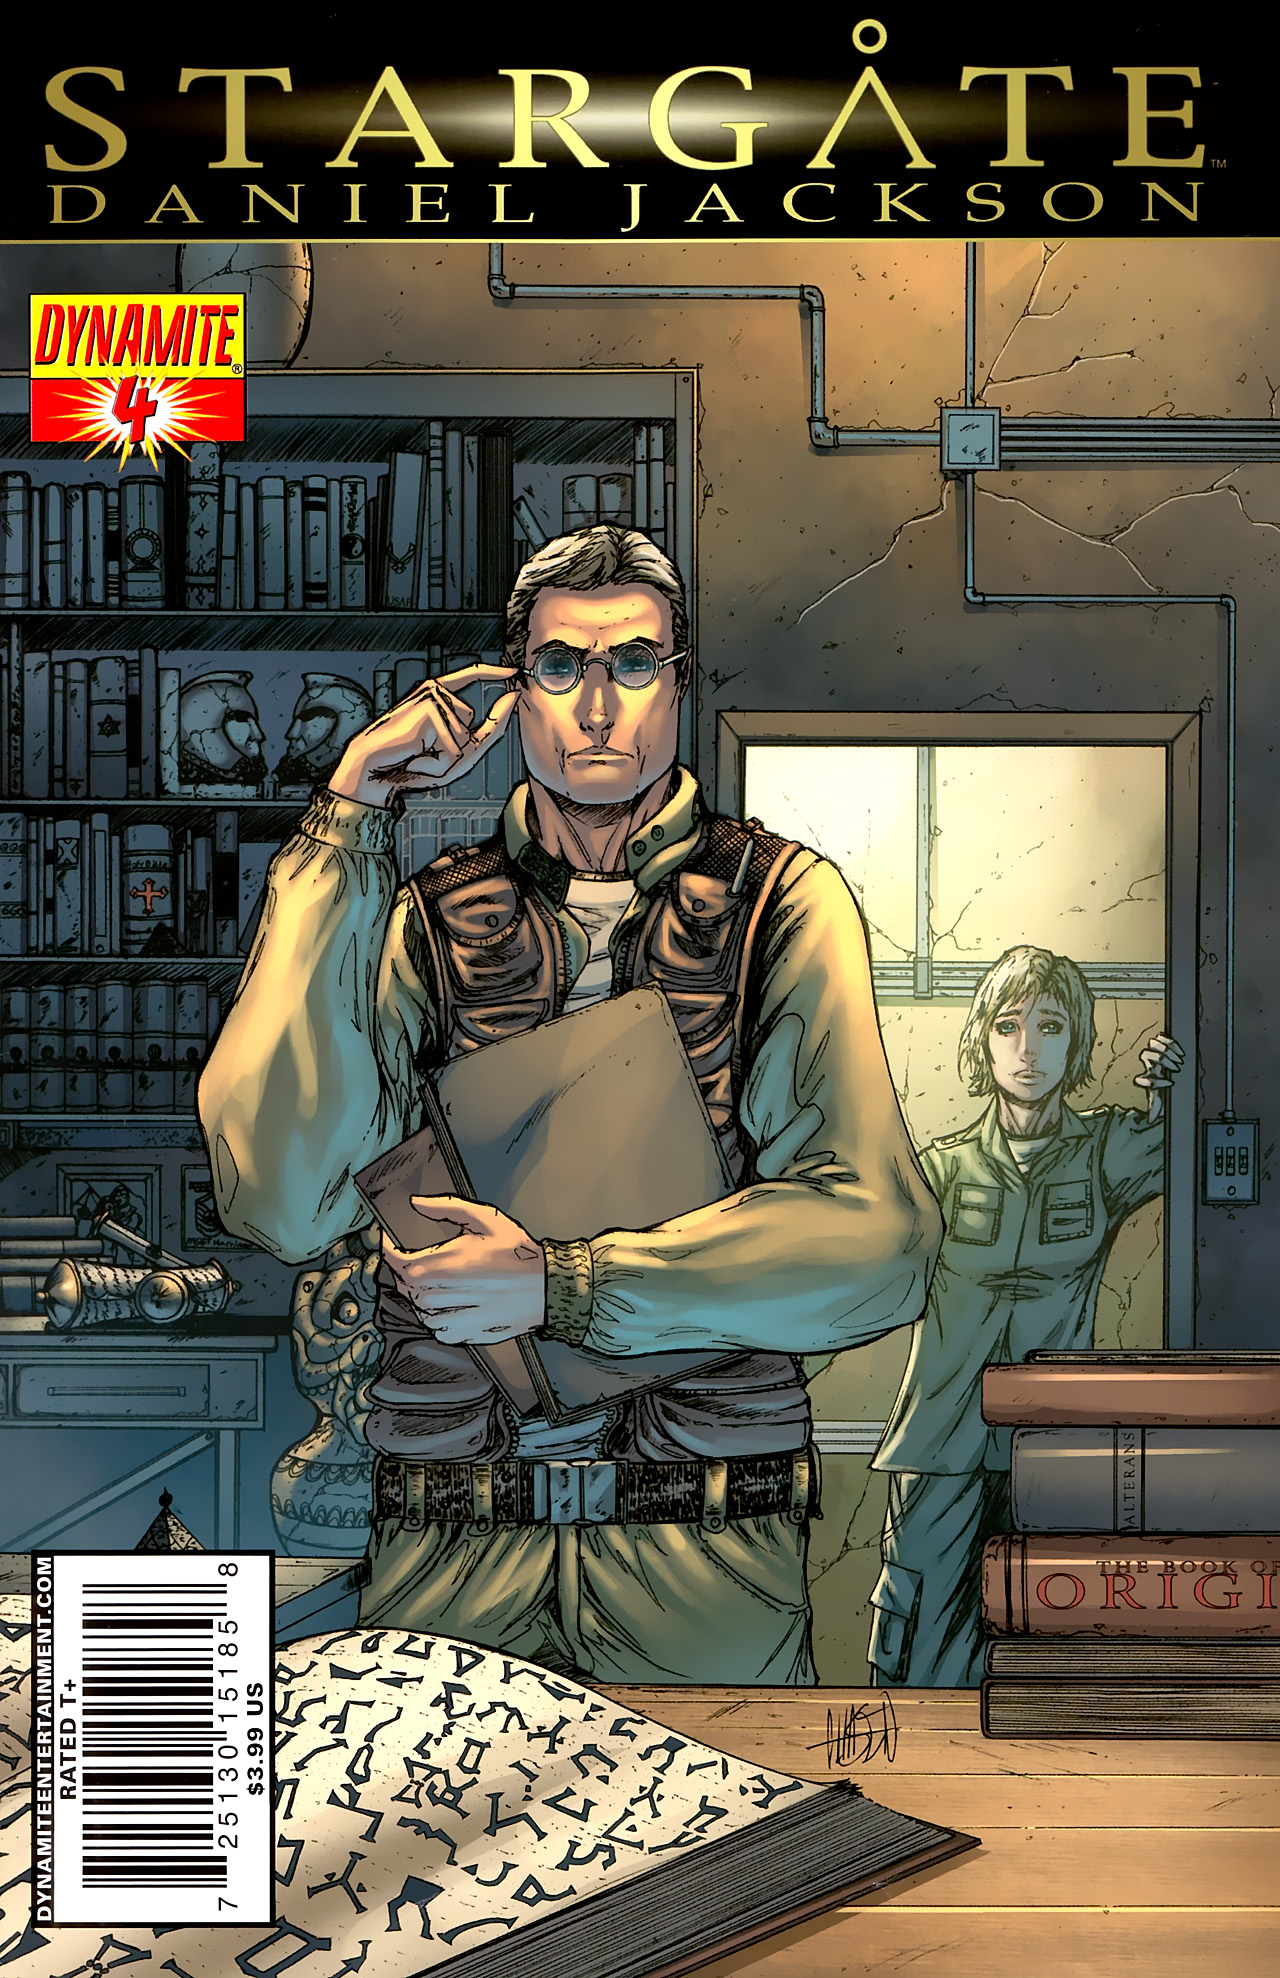 Read online Stargate: Daniel Jackson comic -  Issue #4 - 1